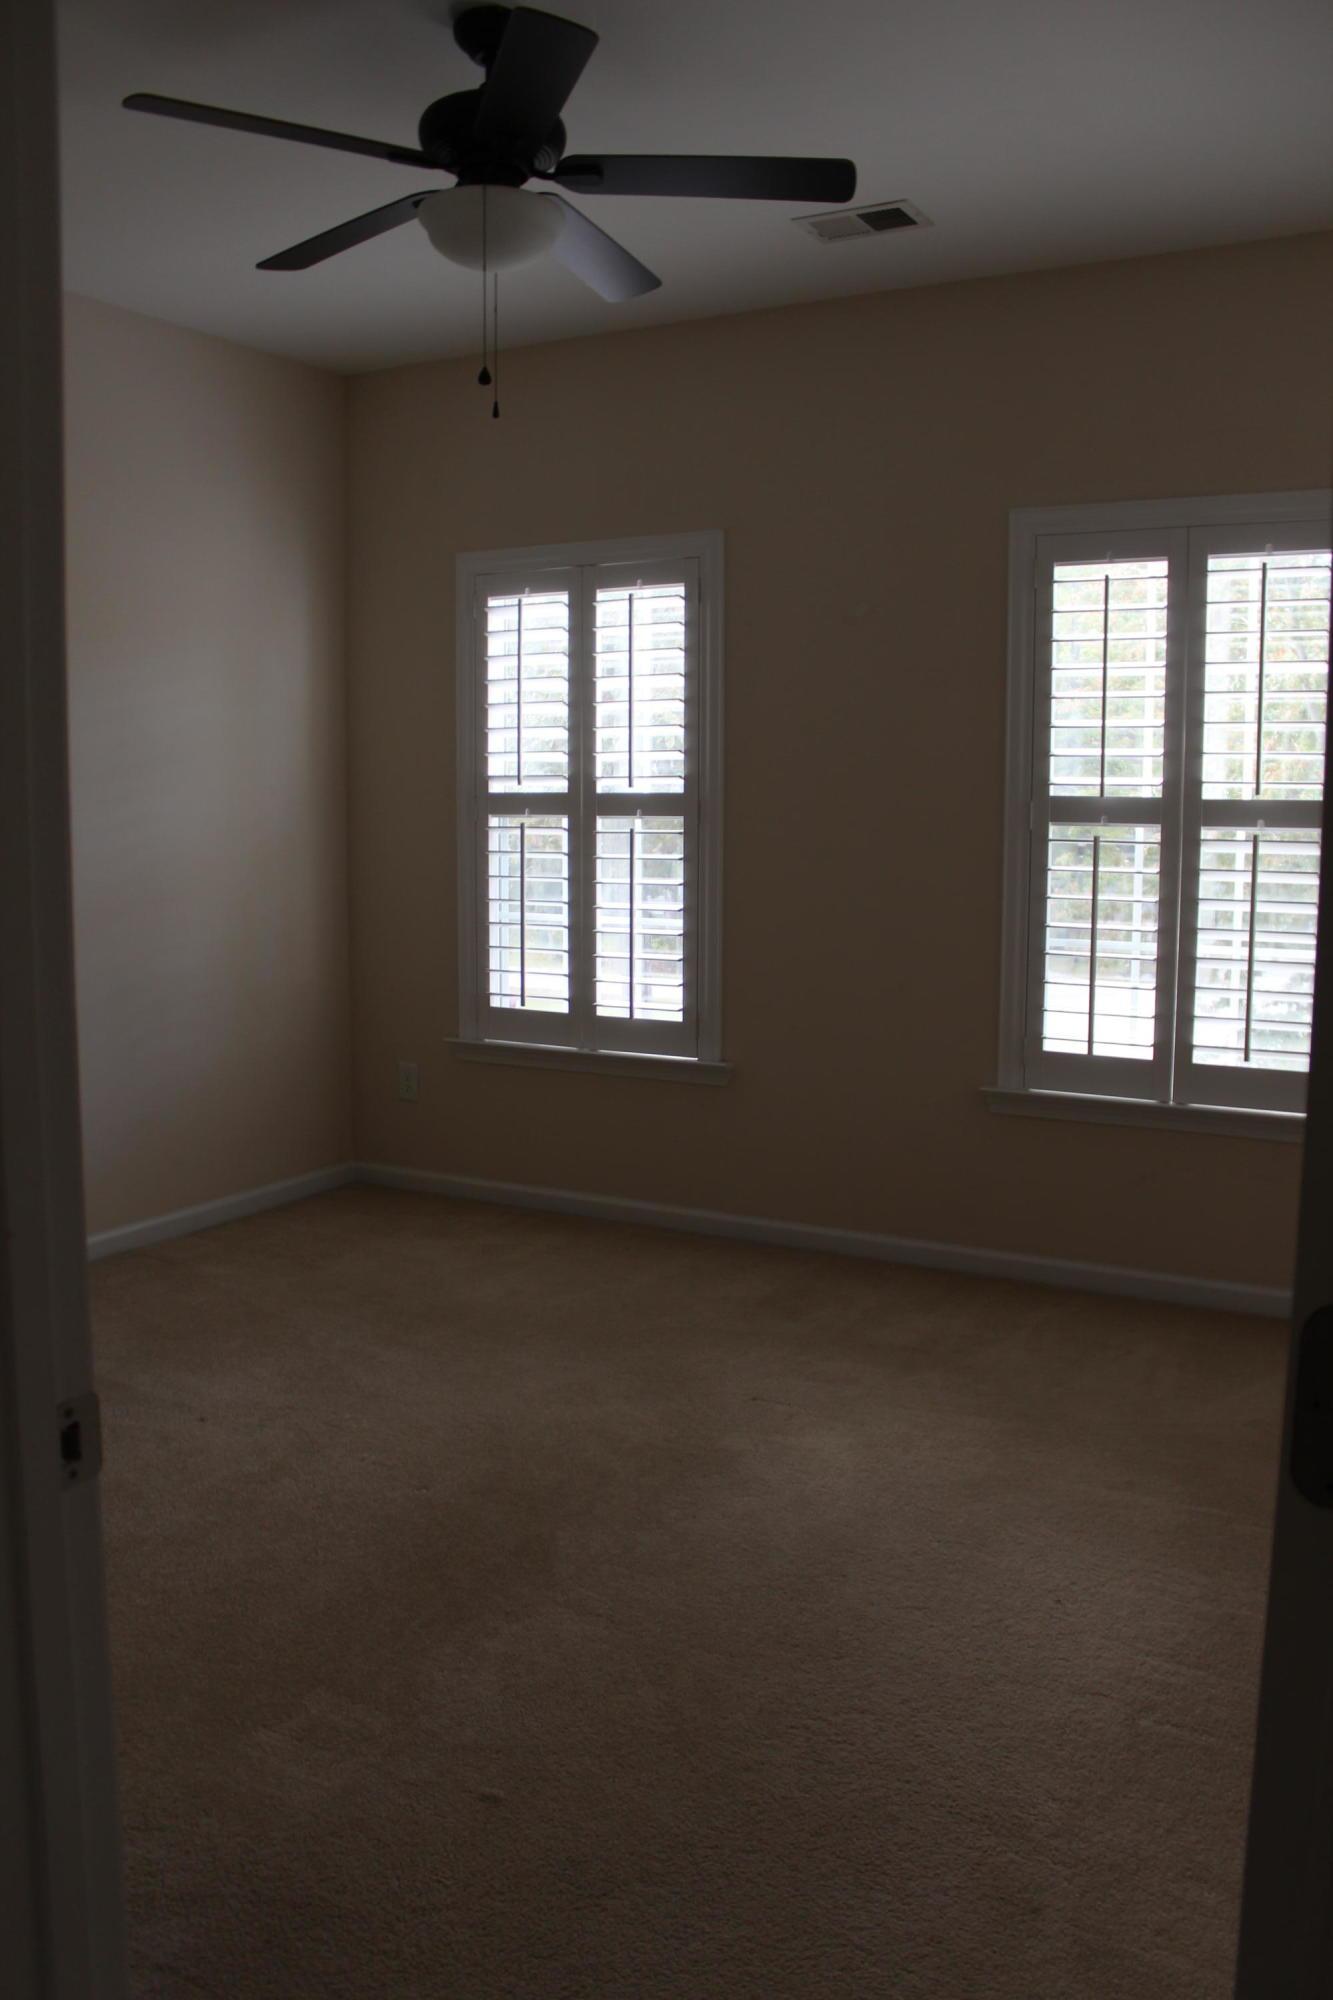 Hunt Club Phase II Homes For Sale - 1220 Walleye, Charleston, SC - 23